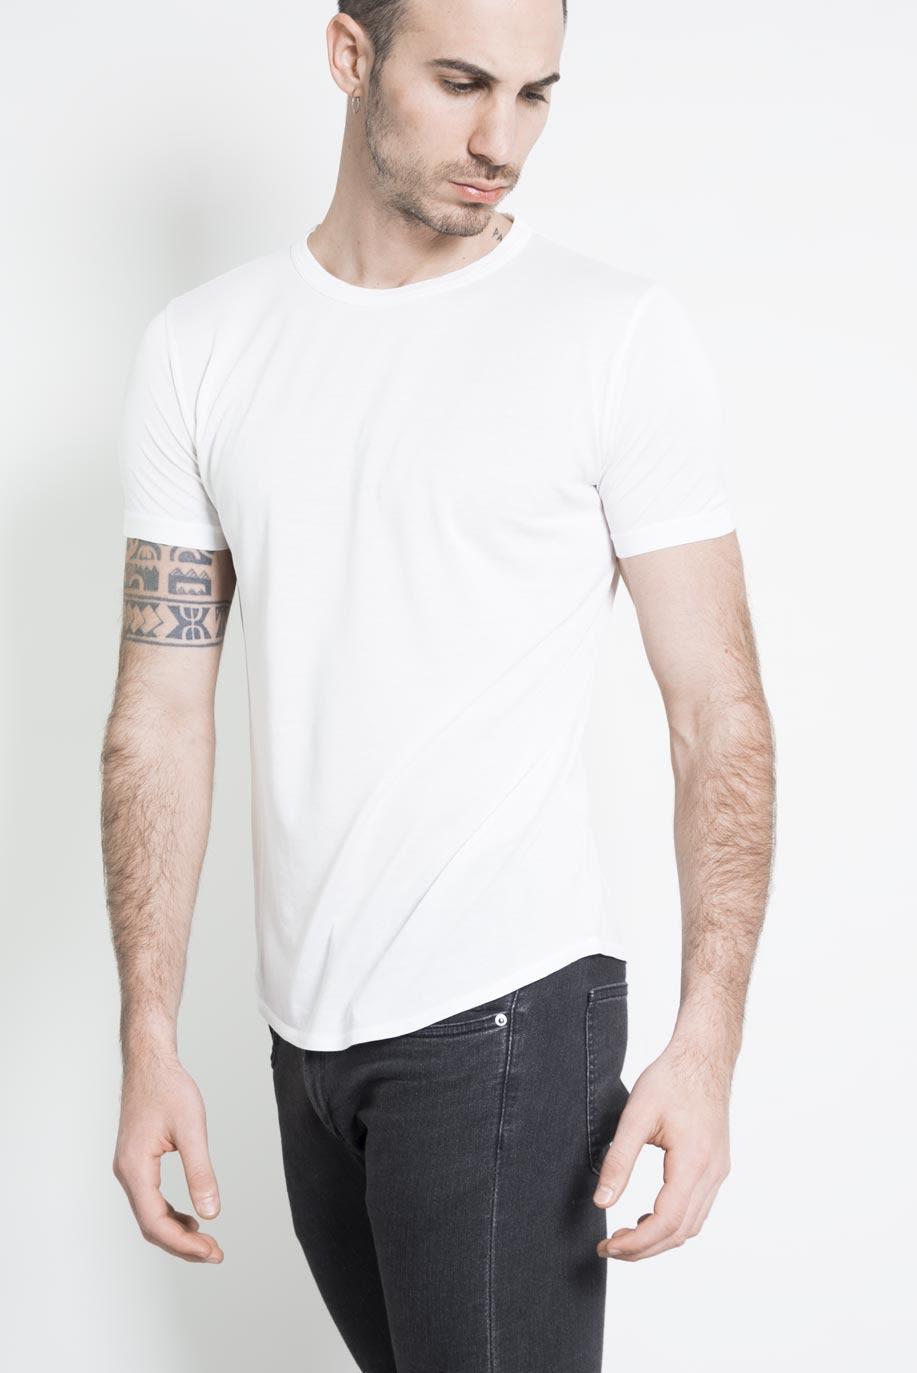 Altalana silk cotton extrafine comfort t shirt 10white for Cotton silk tee shirts